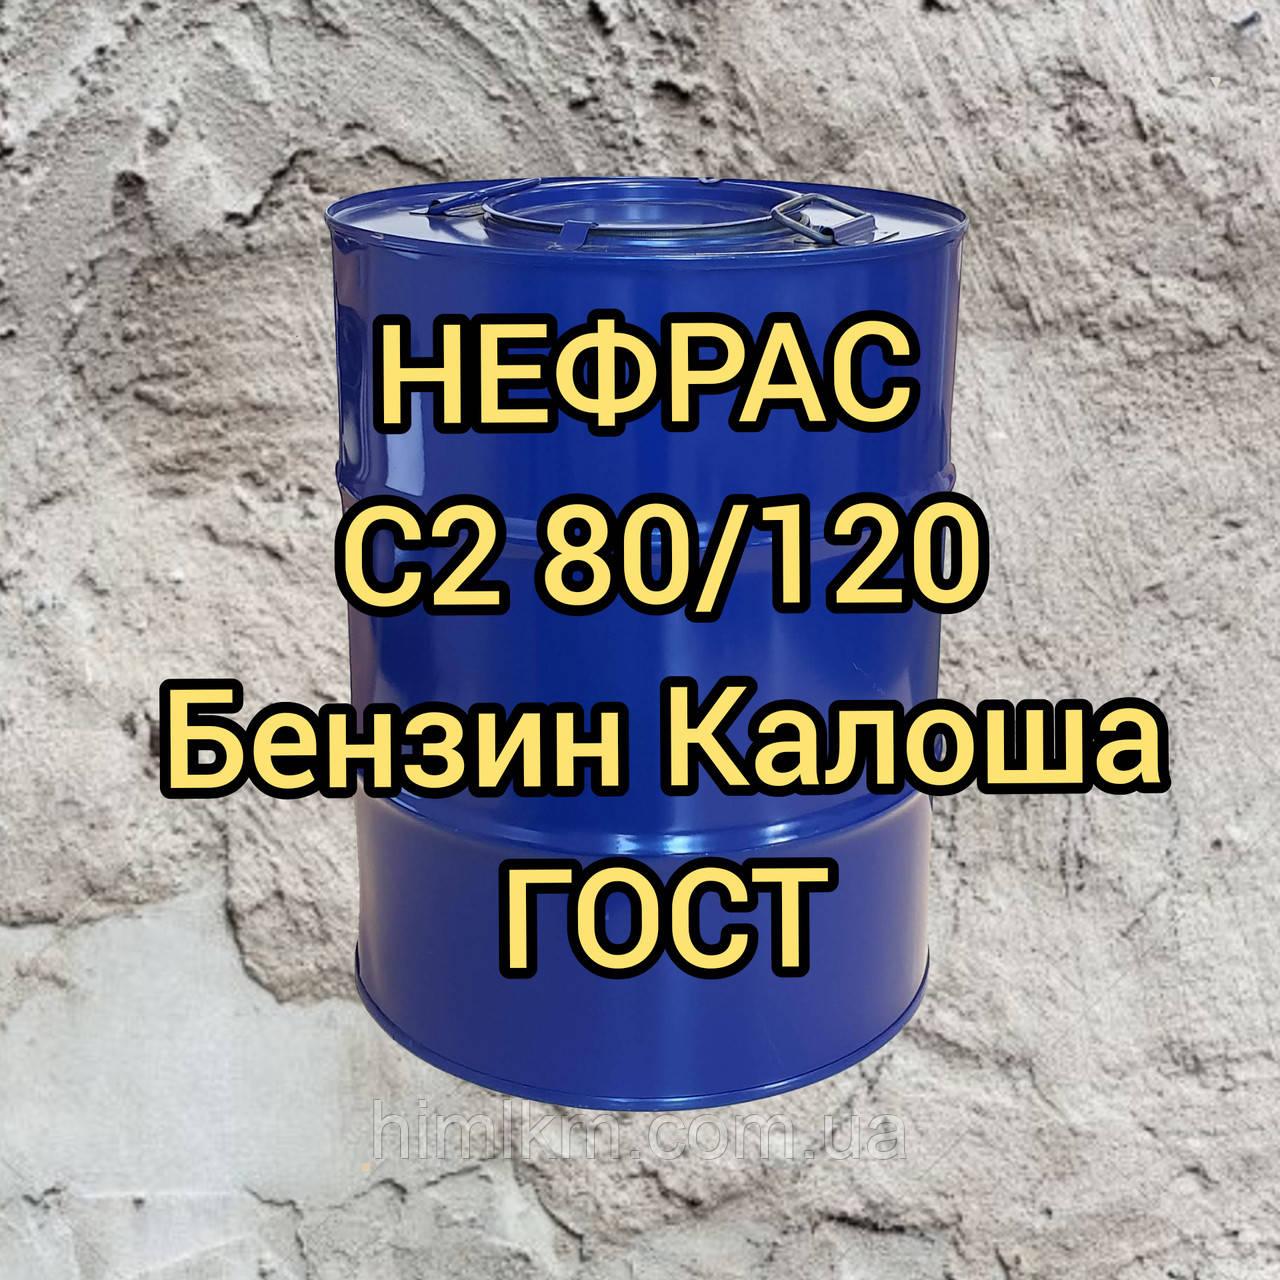 Растворитель Нефрас С2 80/120 Бензин Калоша ГОСТ без запаха